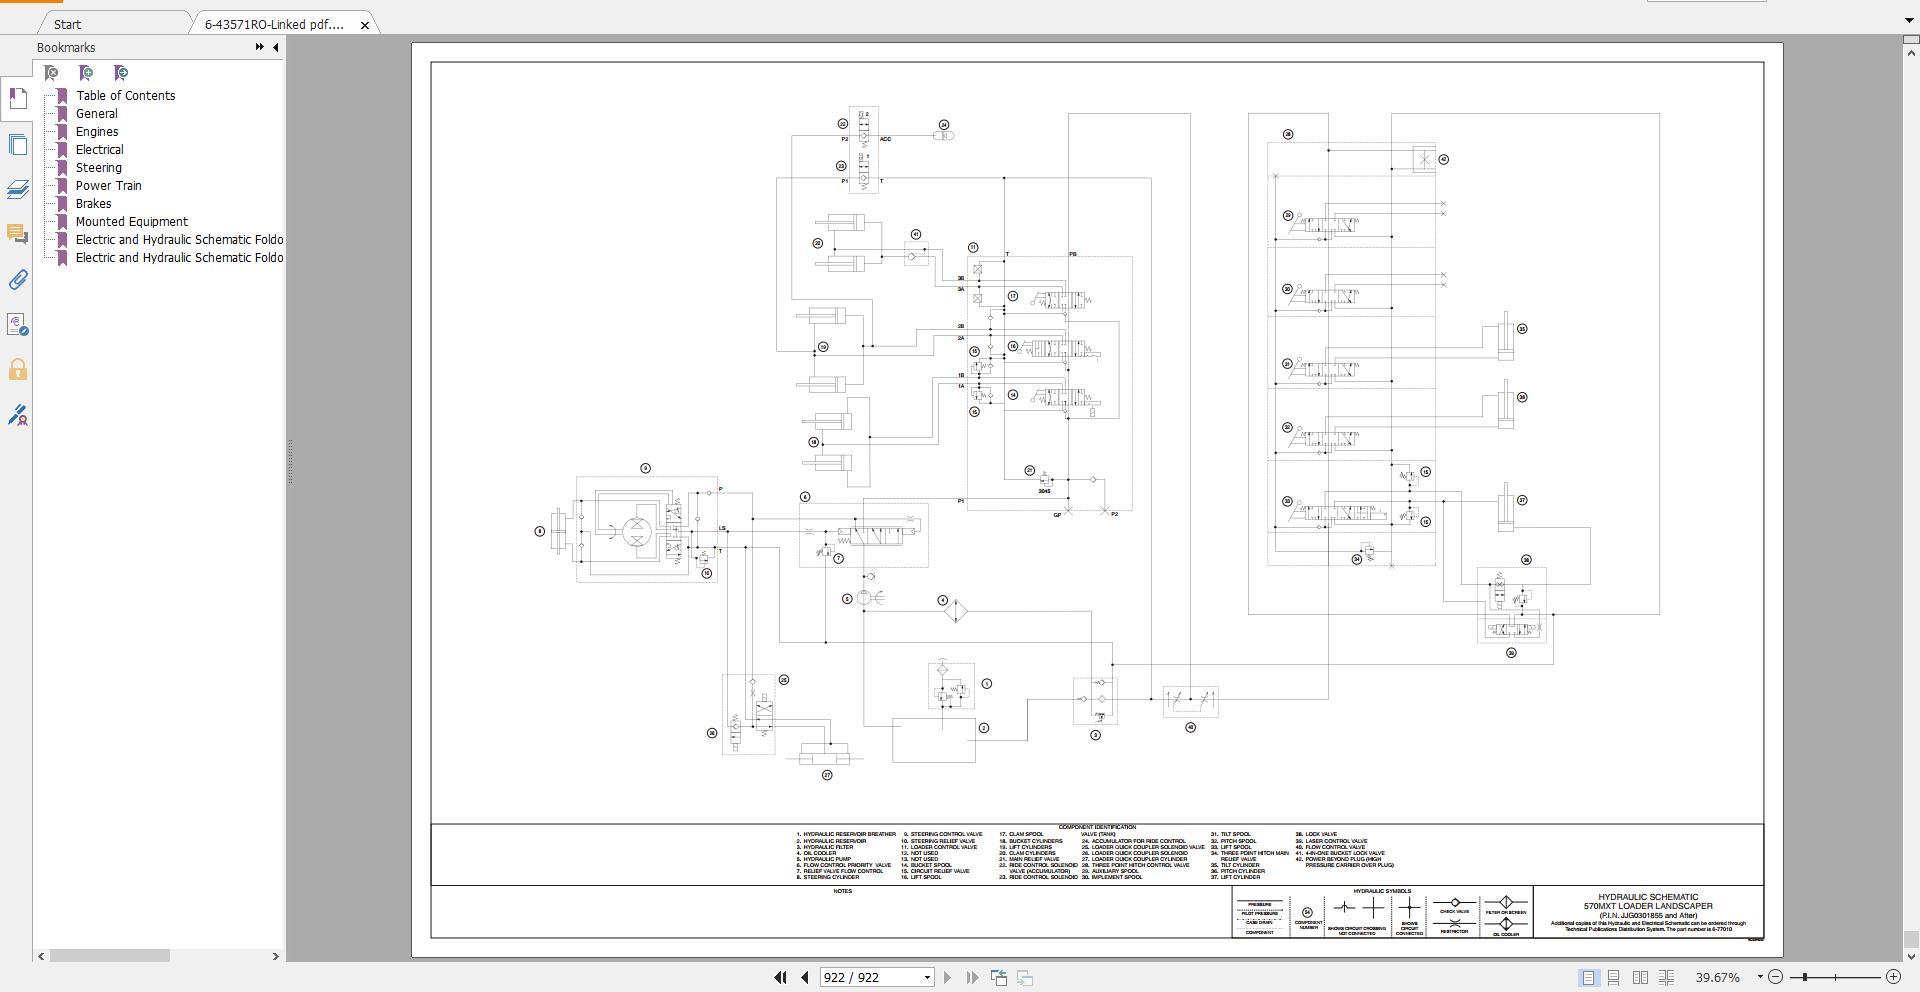 ARMS] Case Landscaper Loader Shop Manual DVD | Auto Repair